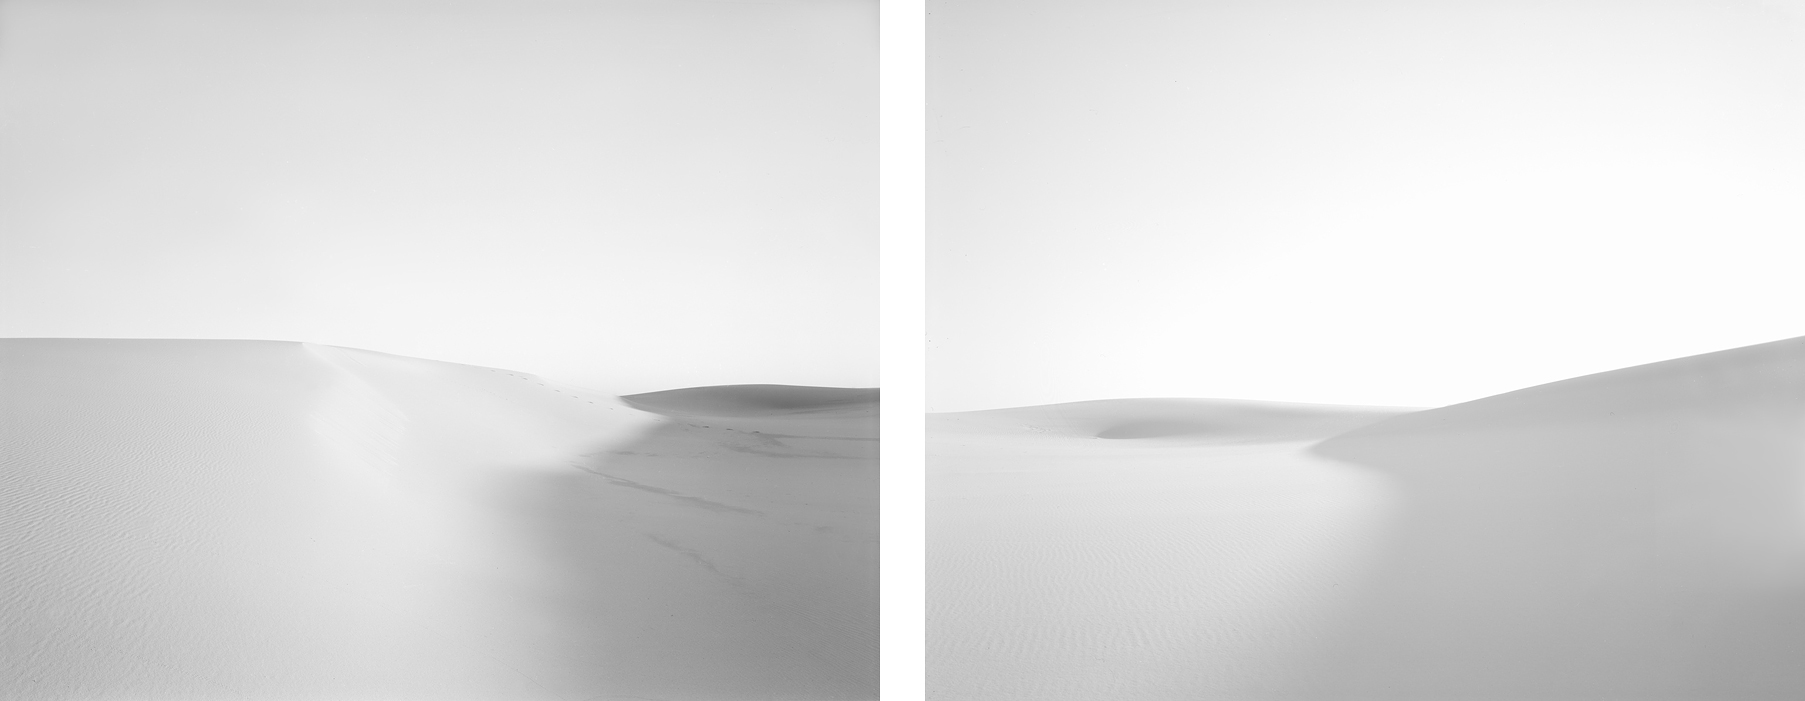 Dune #9, 2011 Diptych